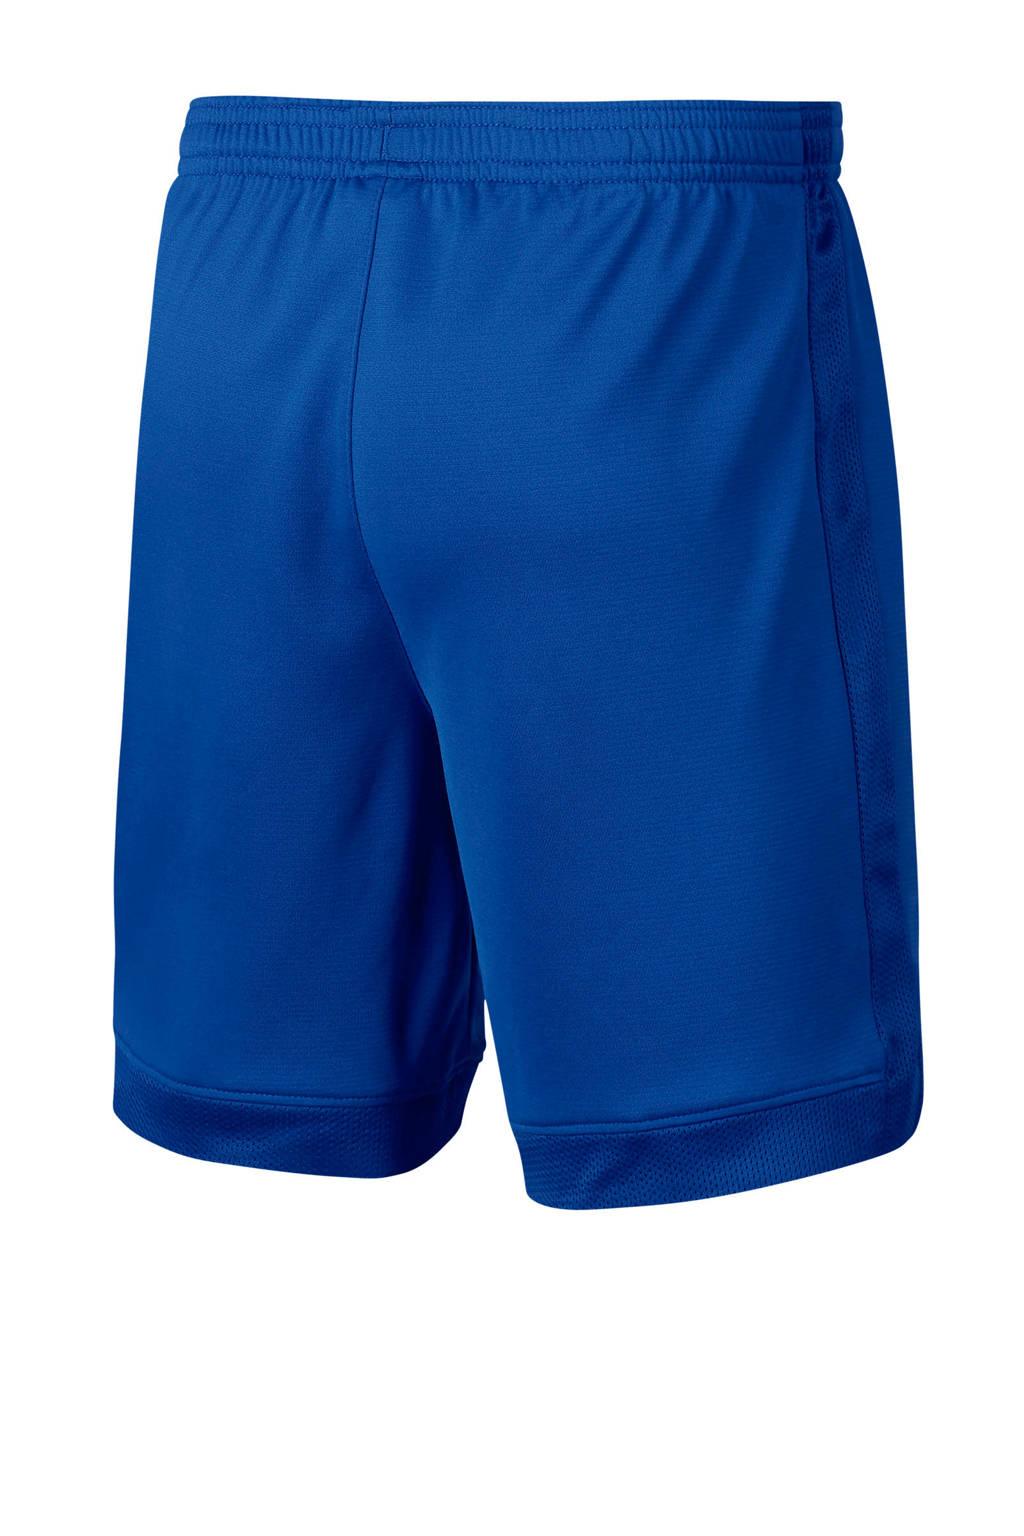 Nike   voetbalshort blauw, Blauw